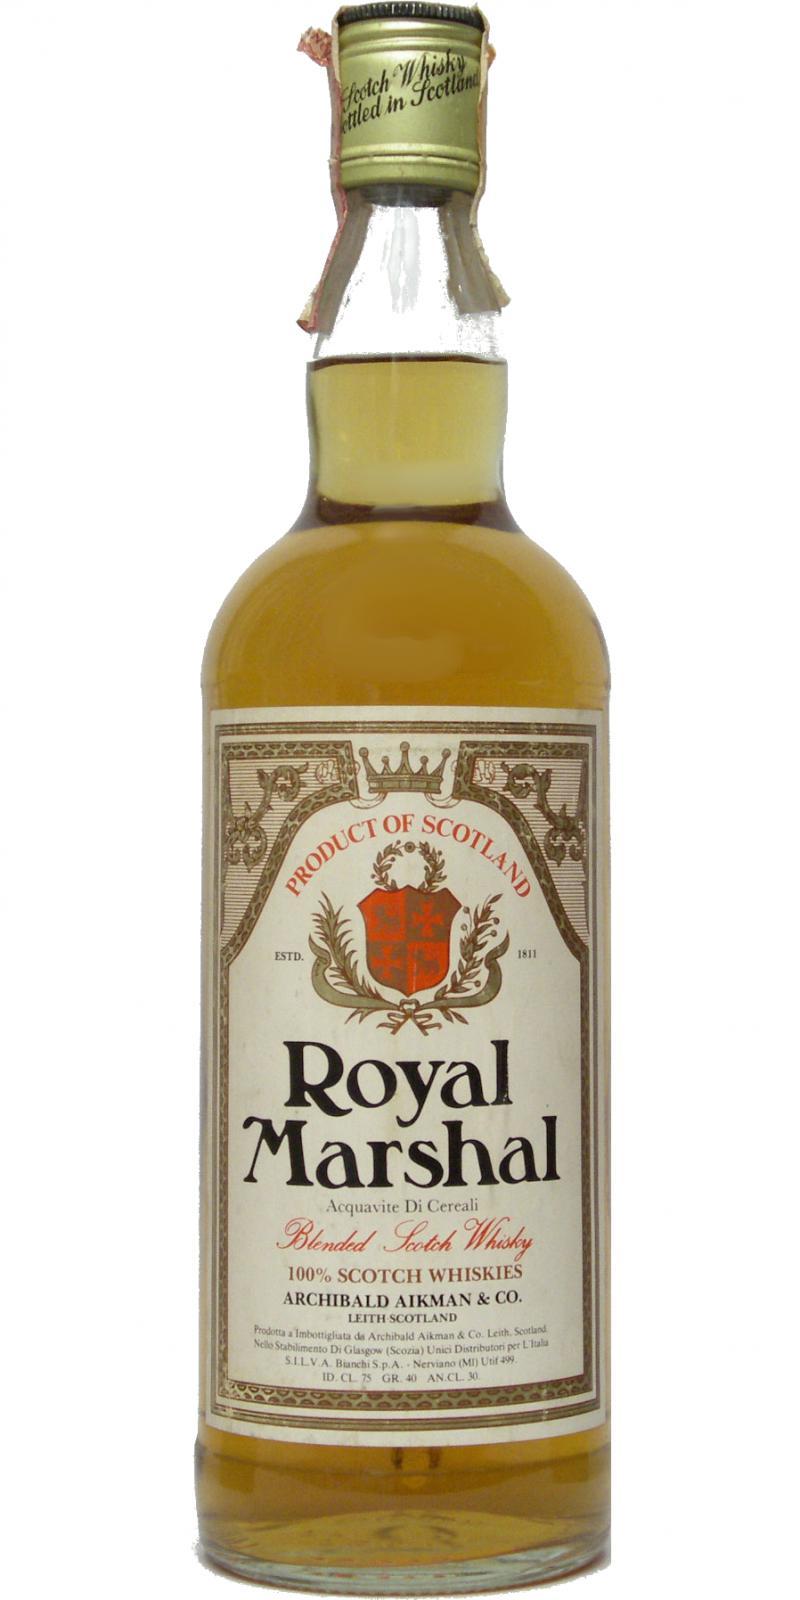 Royal Marshal Blended Scotch Whisky